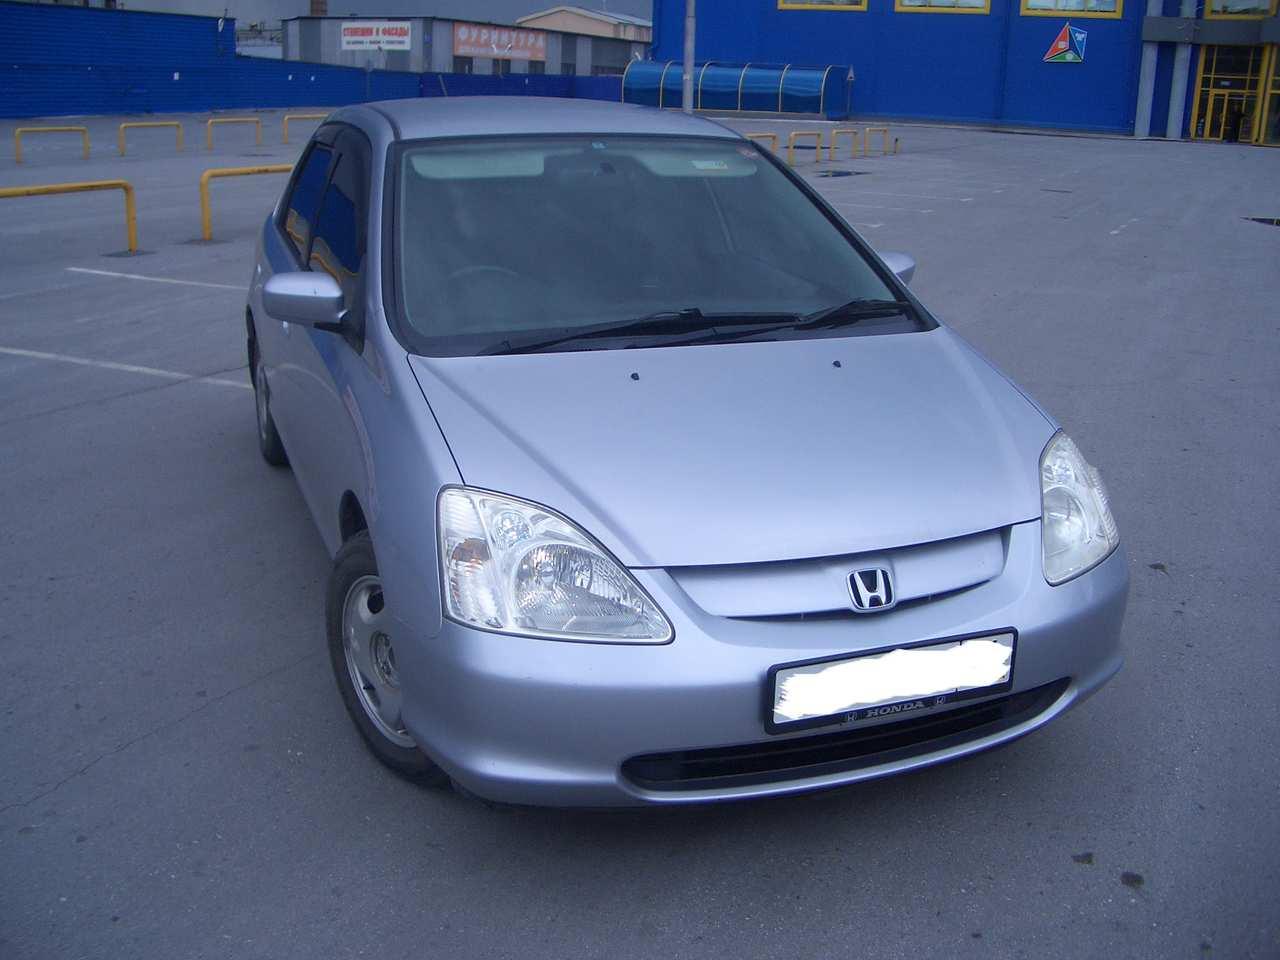 2001 honda civic pictures gasoline ff cvt for sale for Honda limp mode